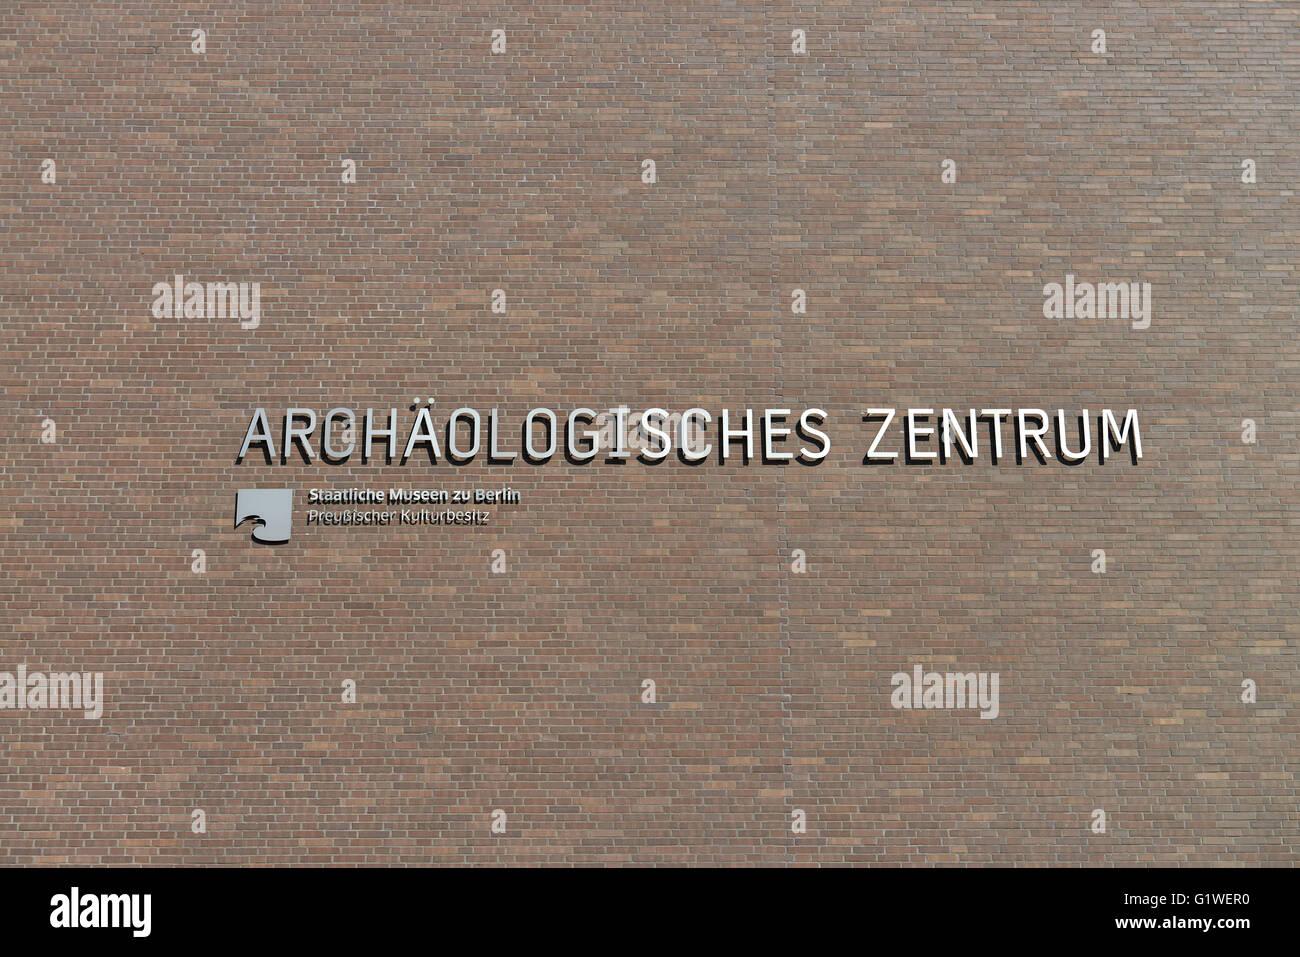 archaeologisches stockfotos archaeologisches bilder alamy. Black Bedroom Furniture Sets. Home Design Ideas